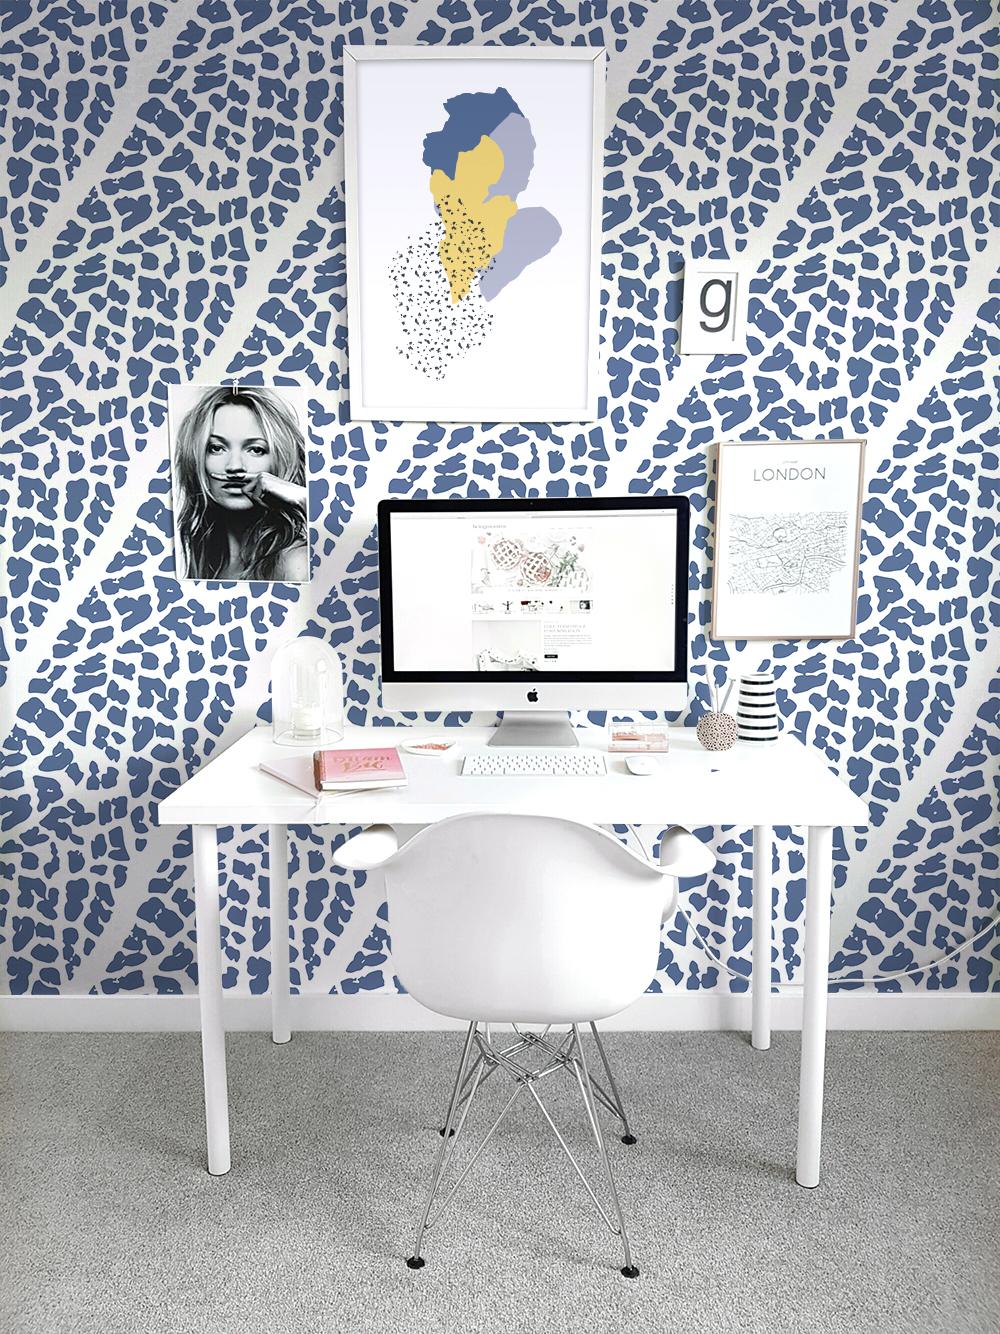 Tina_Roach_OutsideIn_Desk.jpg